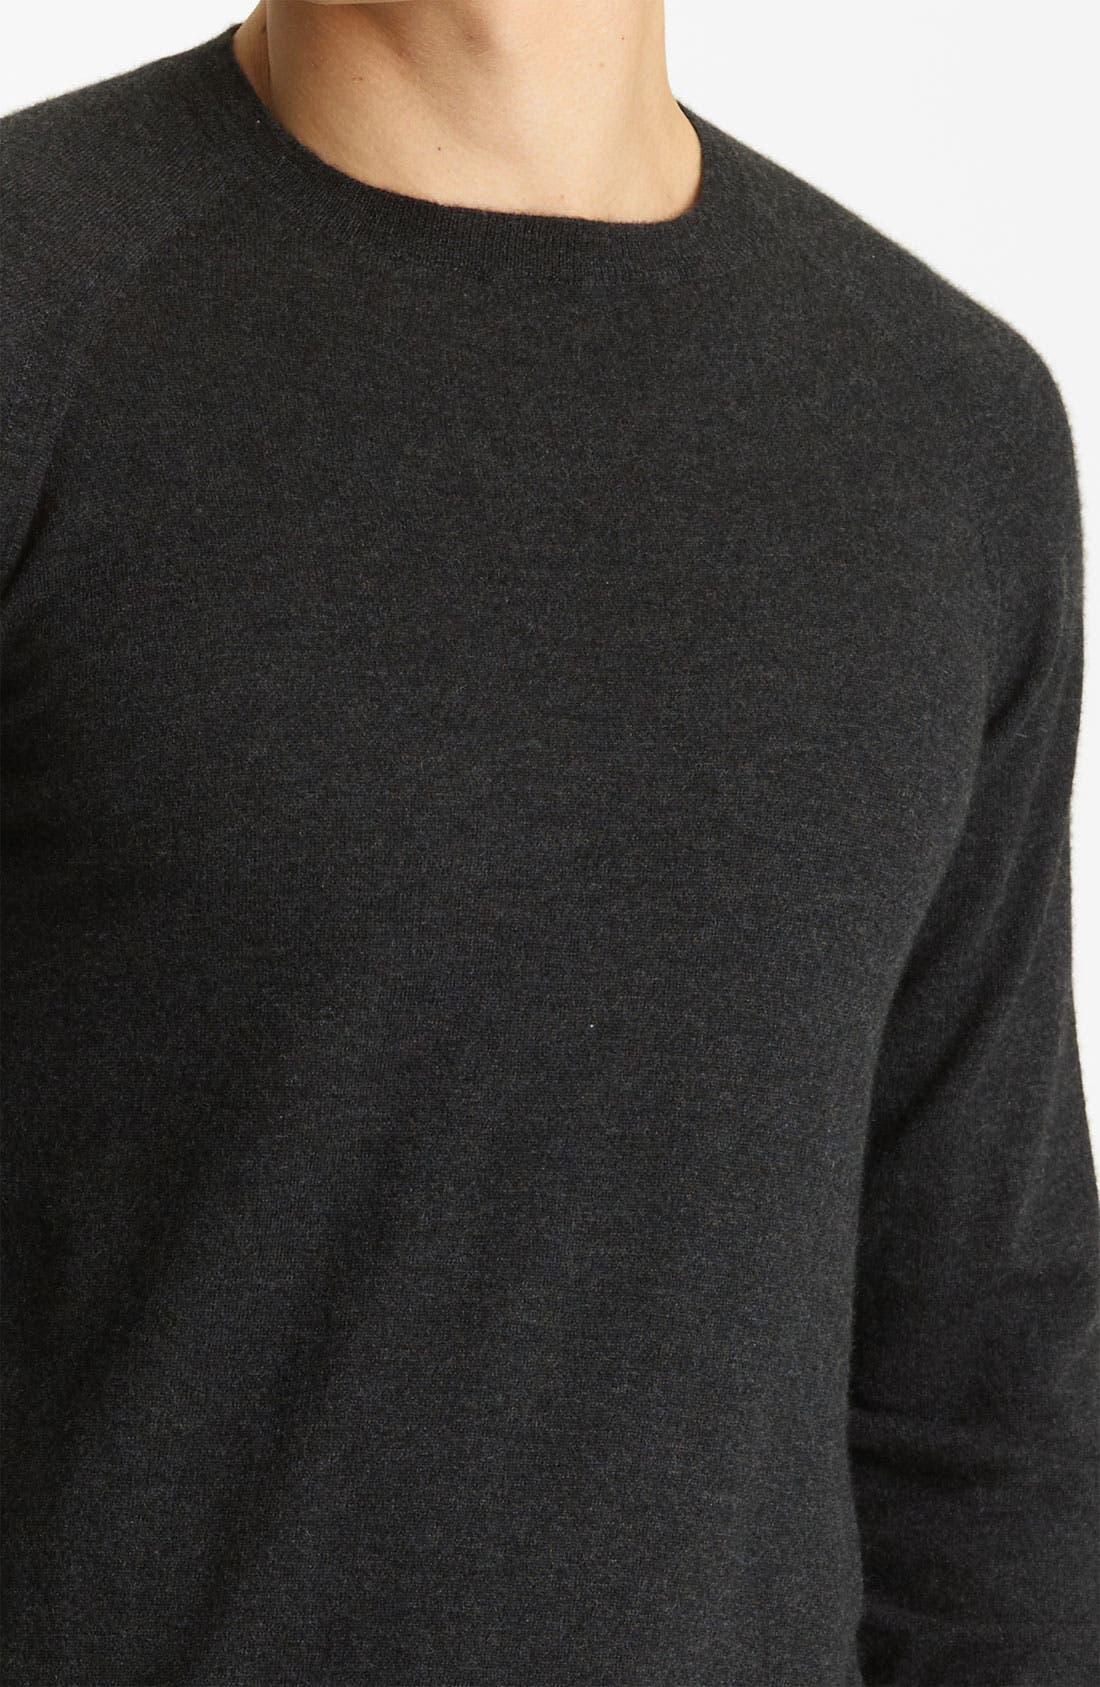 Alternate Image 3  - Marni Contrast Back Sweater